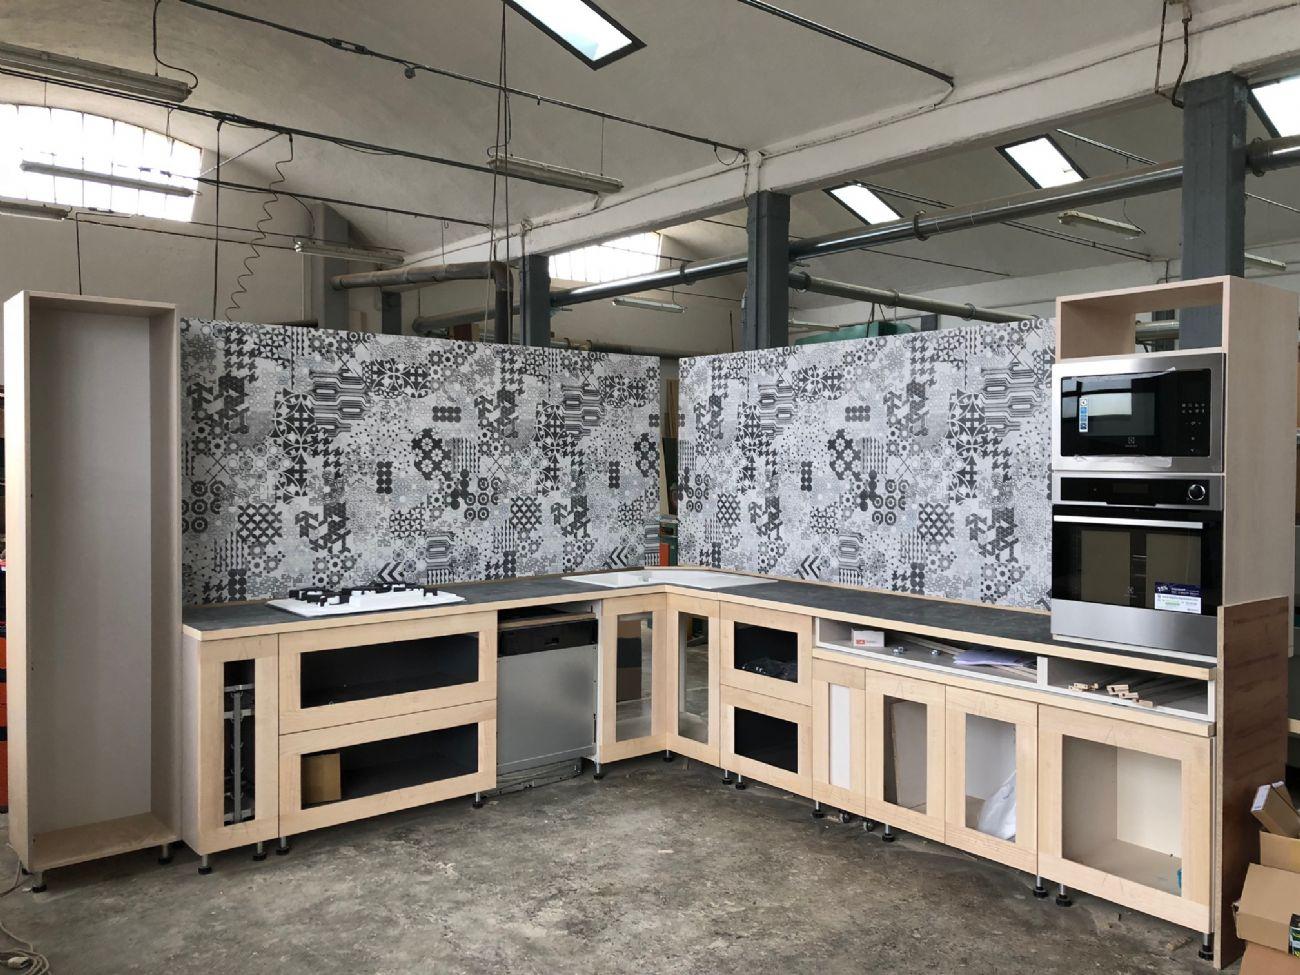 Cucina Su Misura Falegname falegnameria europa - mobili e cucine su misura, arredamenti